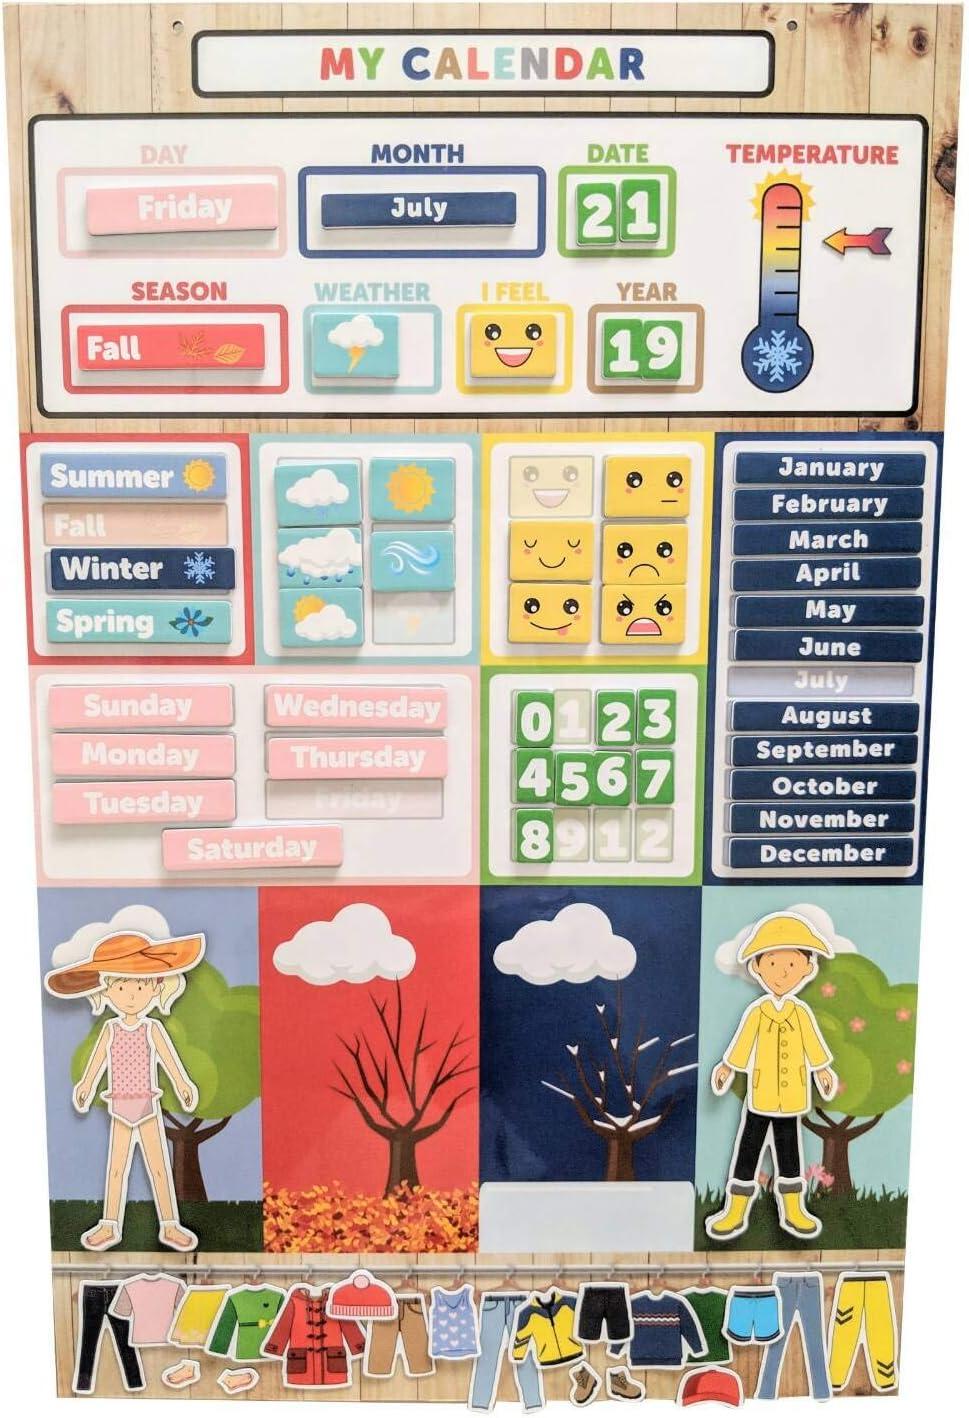 My First Daily Magnetic Learning Calendar For Kids, Educational Calendar for Fridge, Kids Preschool & Play Based Weather Calendar